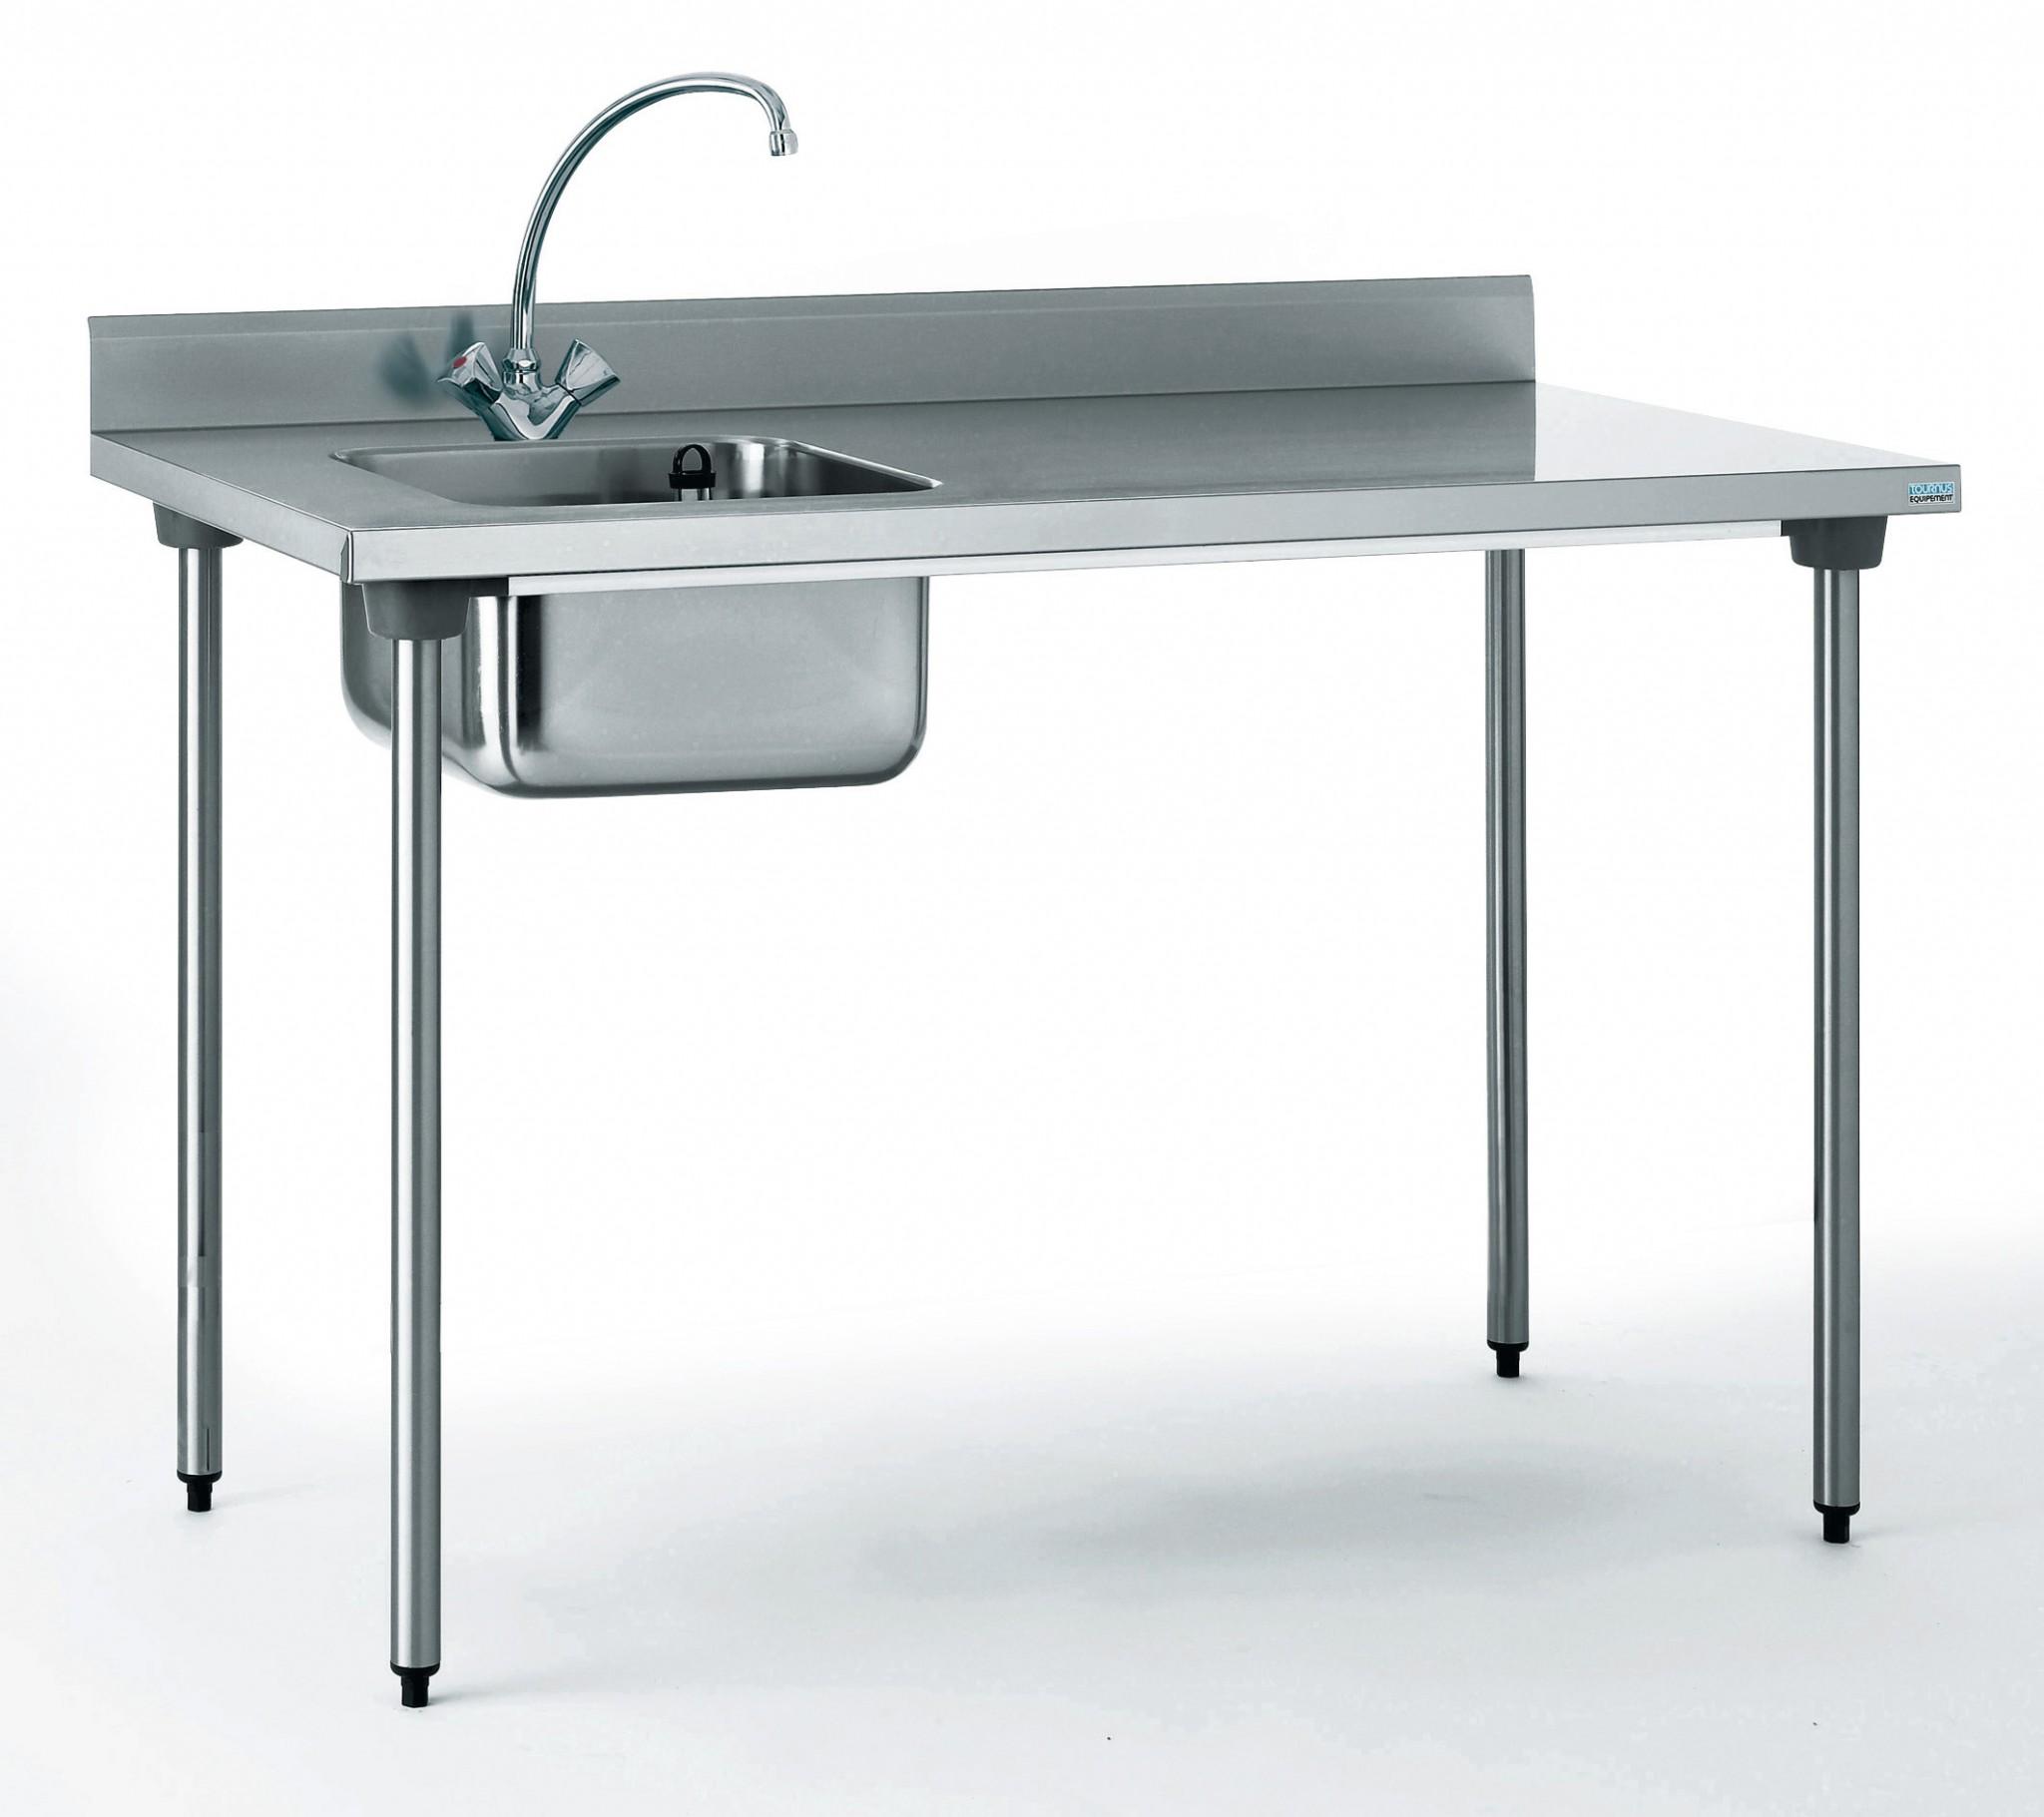 Table du chef chr 700x1200 bac a gauche avec robin for Table cuisine pro